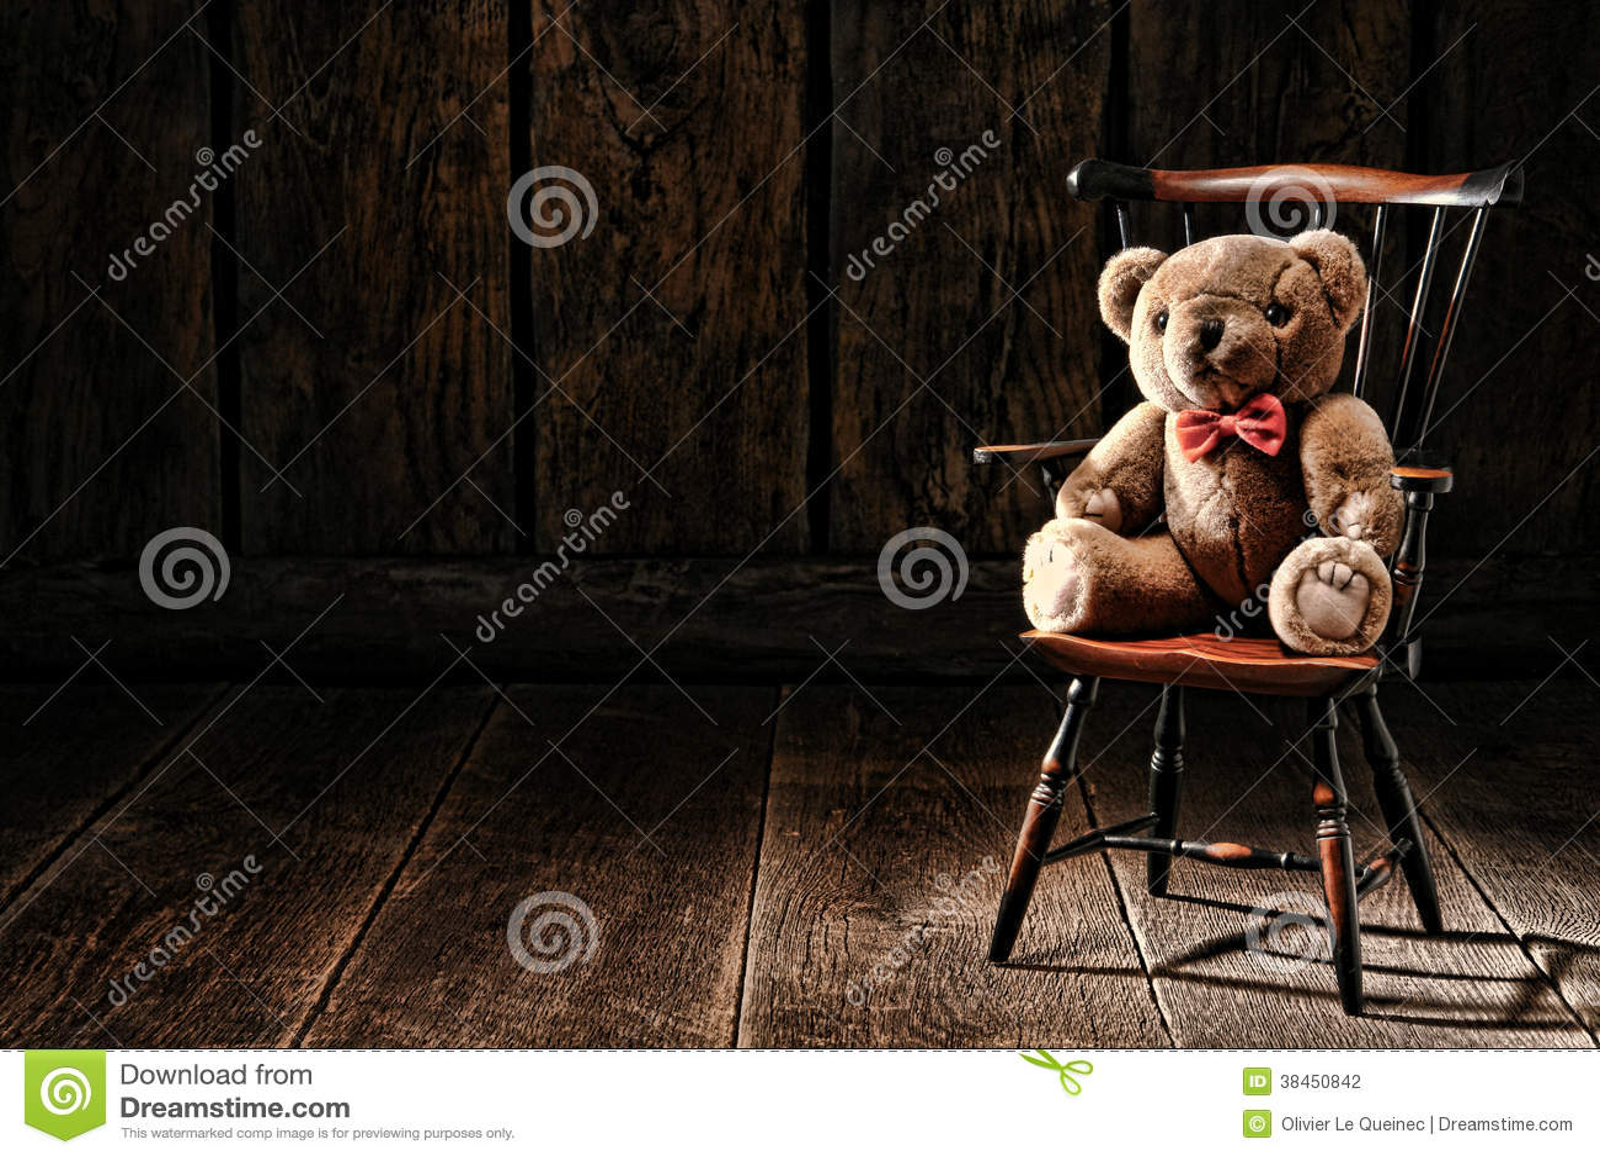 Vintage Teddy Bear Stuffed Animal Toy On Old Chair Stock